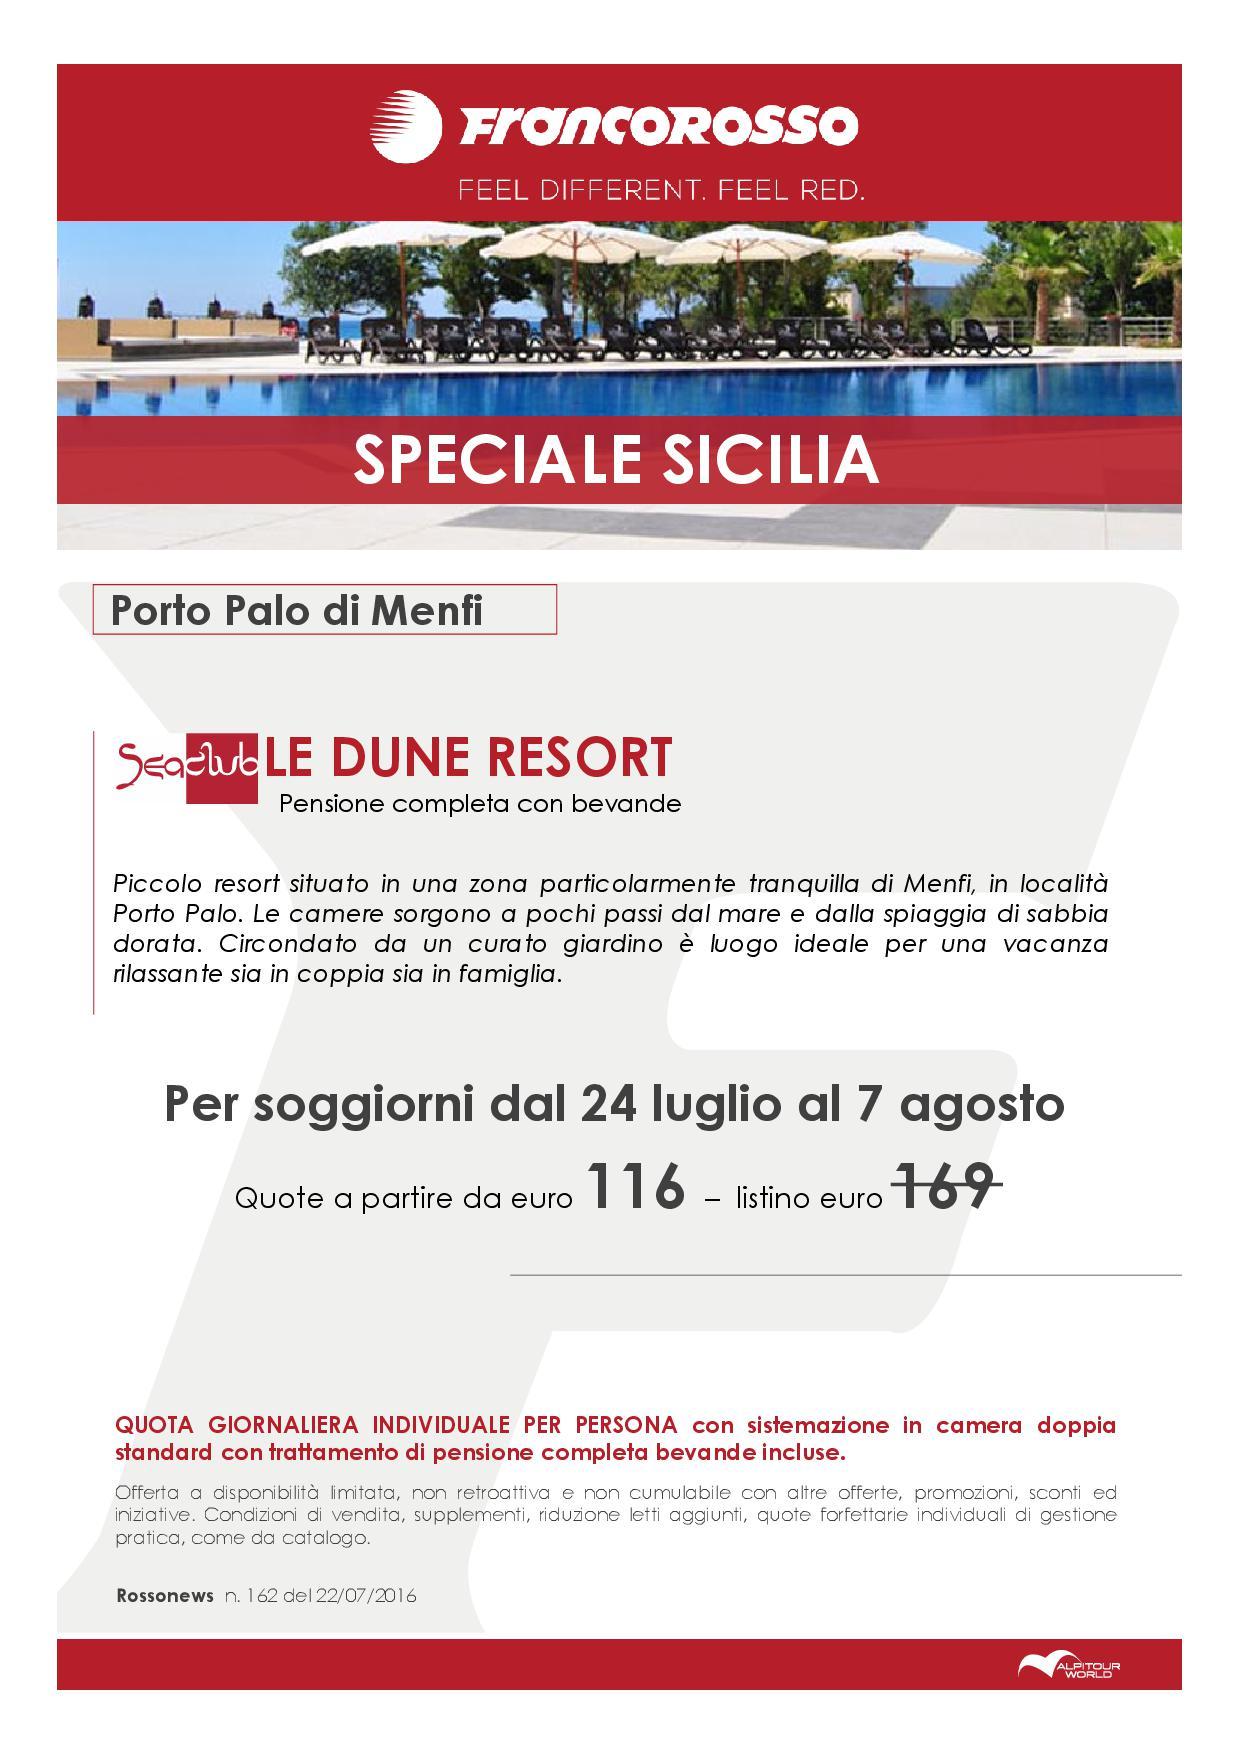 Emejing Offerte Soggiorno Sicilia Images - Amazing Design Ideas 2018 ...